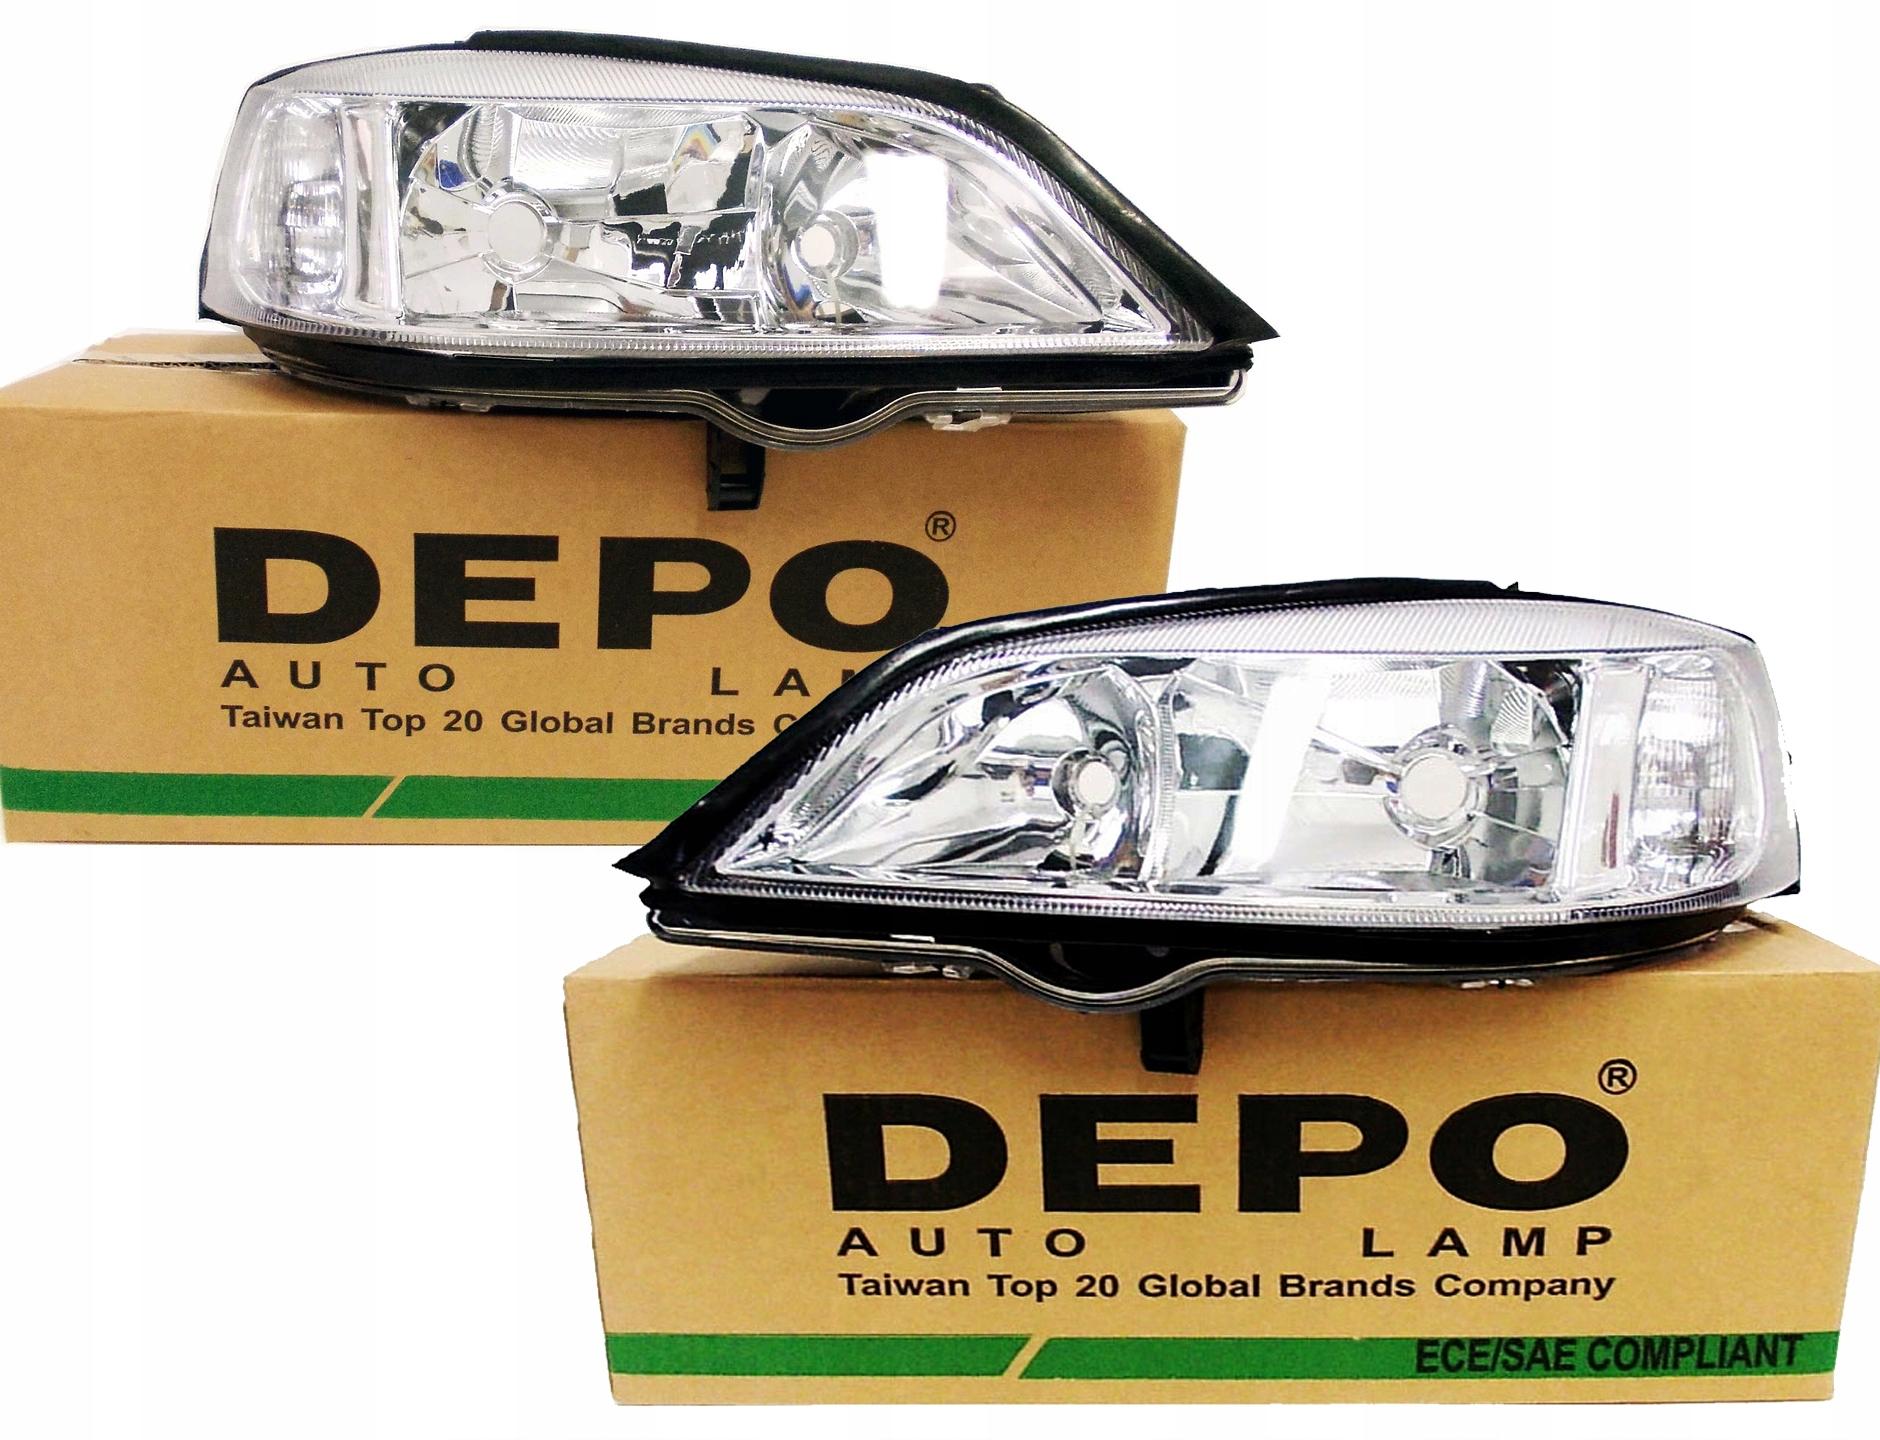 лампы фары новые opel astra ii 2 g depo l+p